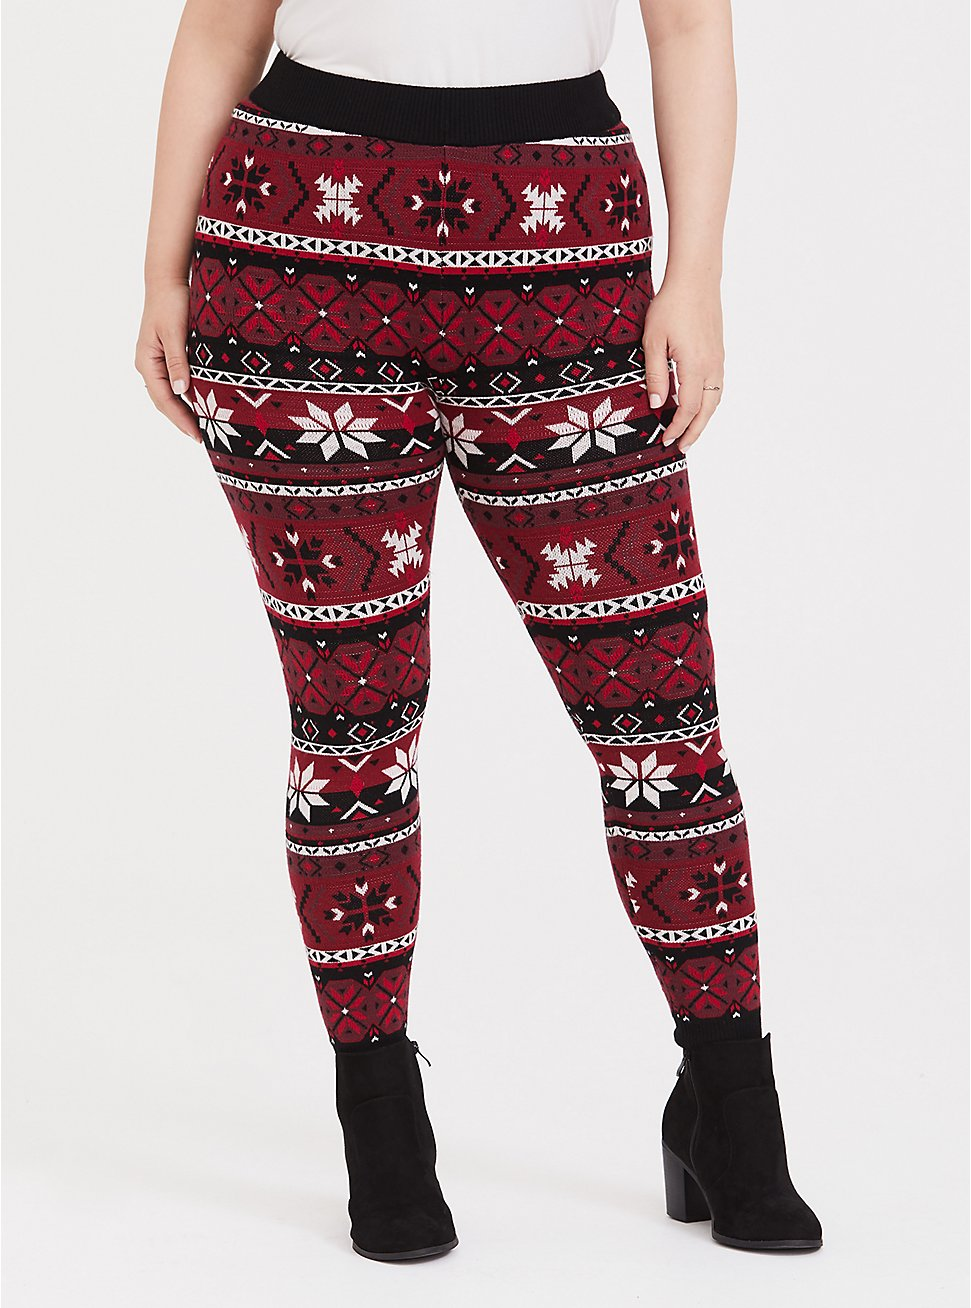 Sweater Knit Legging Fair Isle Red & Black